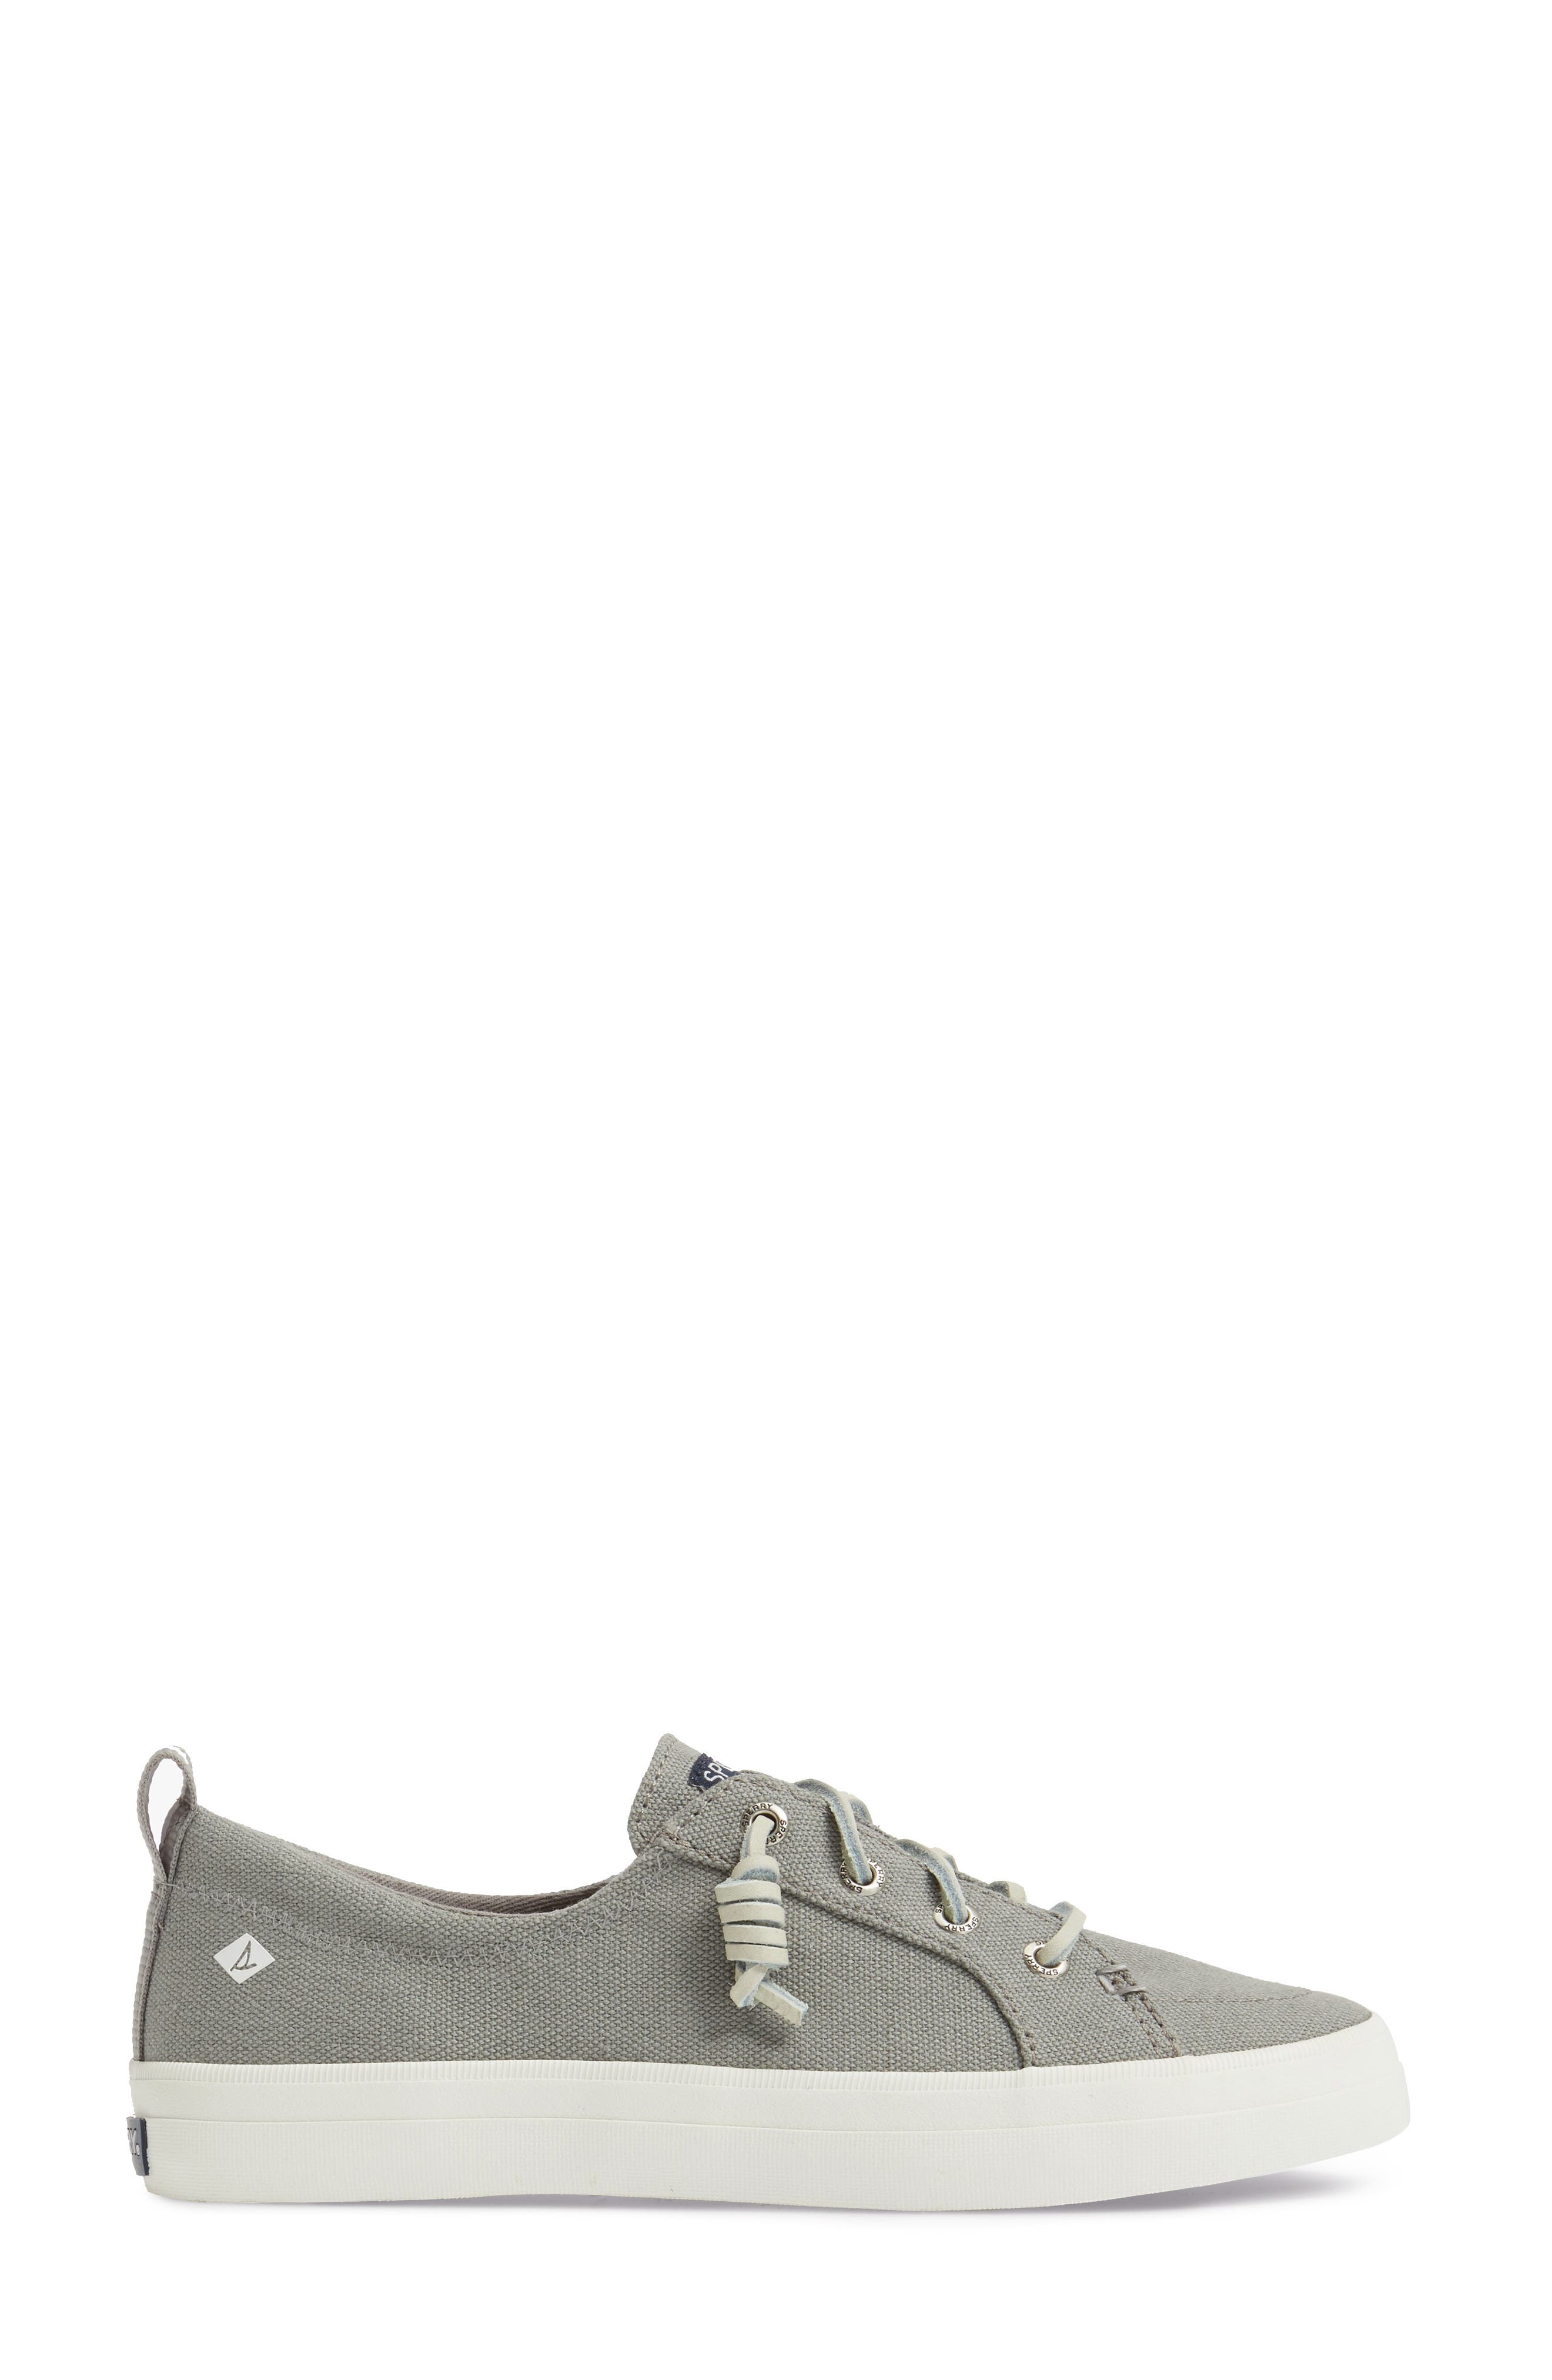 Crest Vibe Sneaker,                             Alternate thumbnail 3, color,                             Grey Canvas